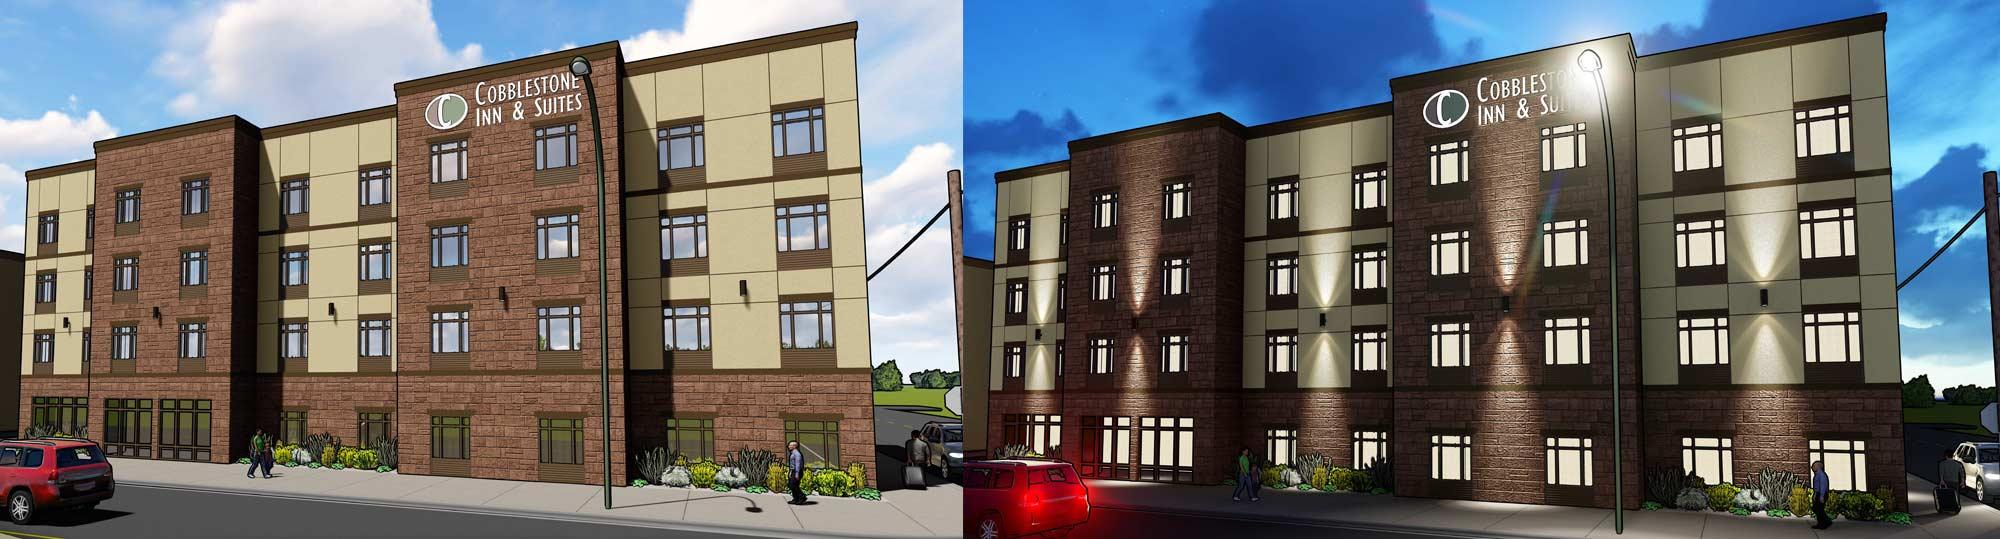 Cobblestone Inn and Suites Ashland